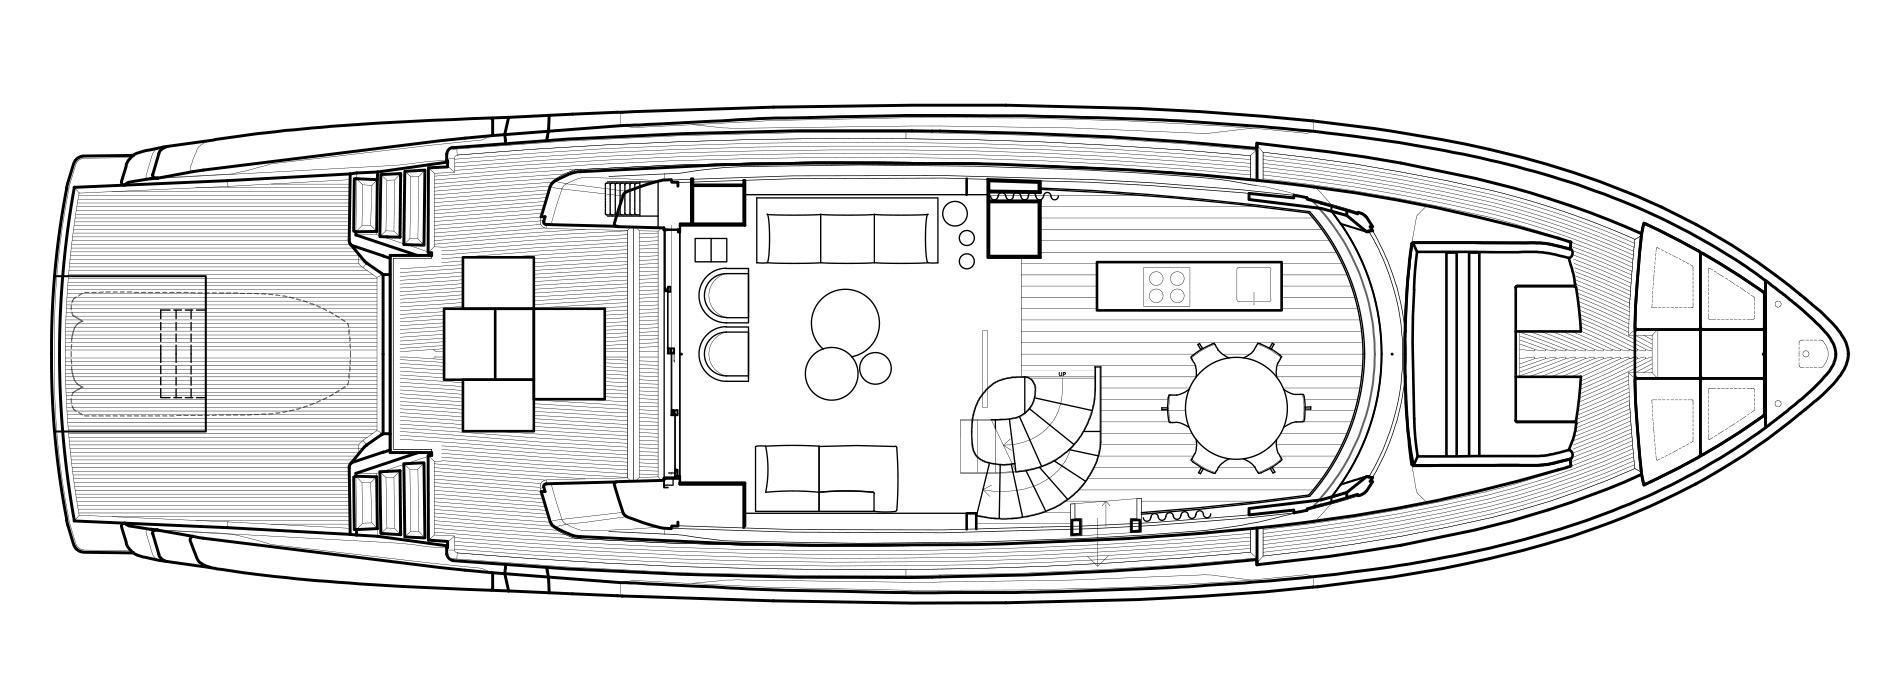 Sanlorenzo Yachts SX76 Главная палуба версия Lissoni